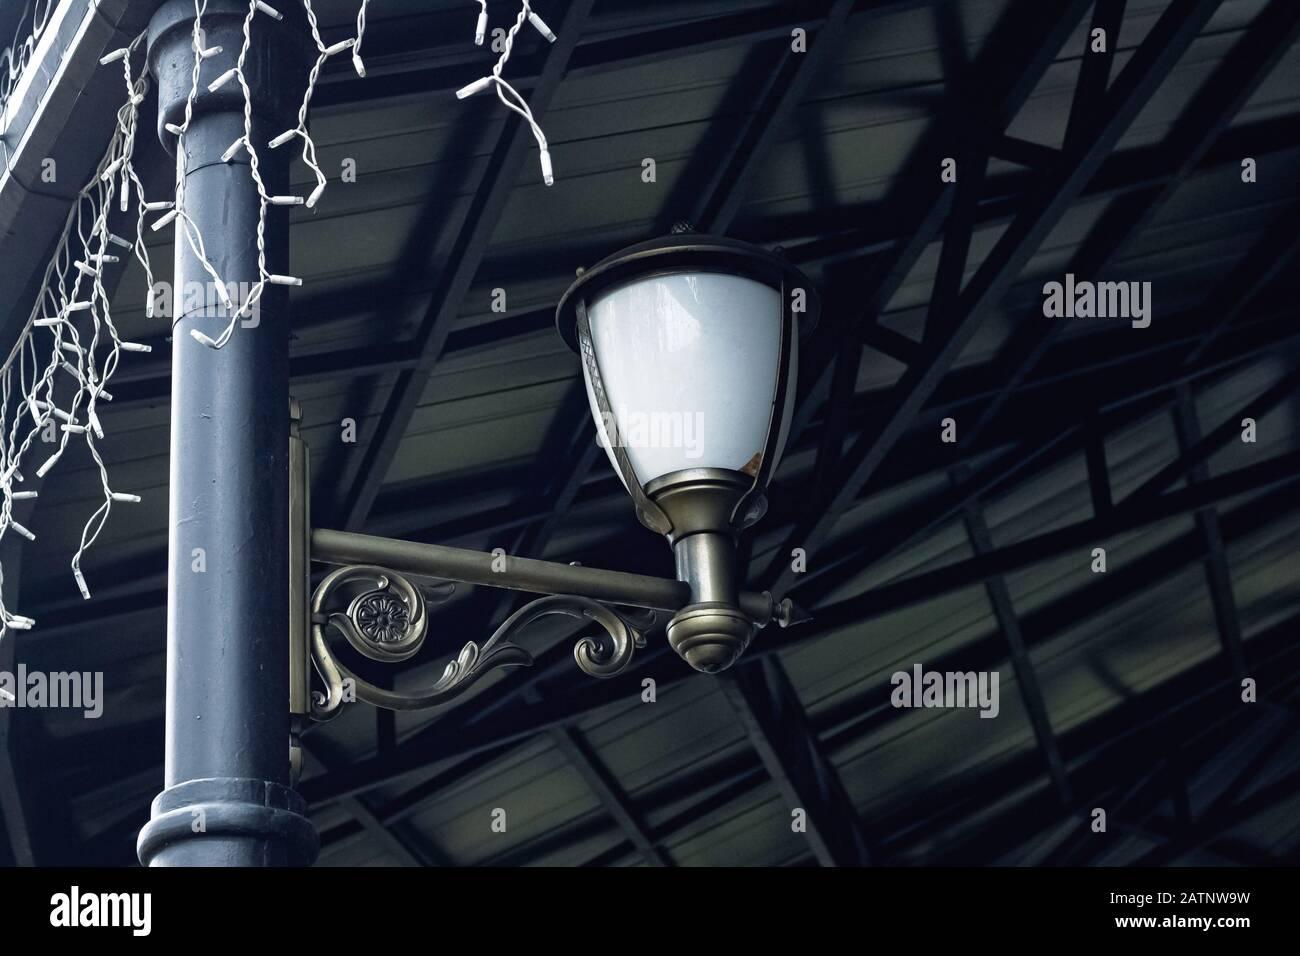 White lantern in retro style on a pillar of a forged arbor Stock Photo